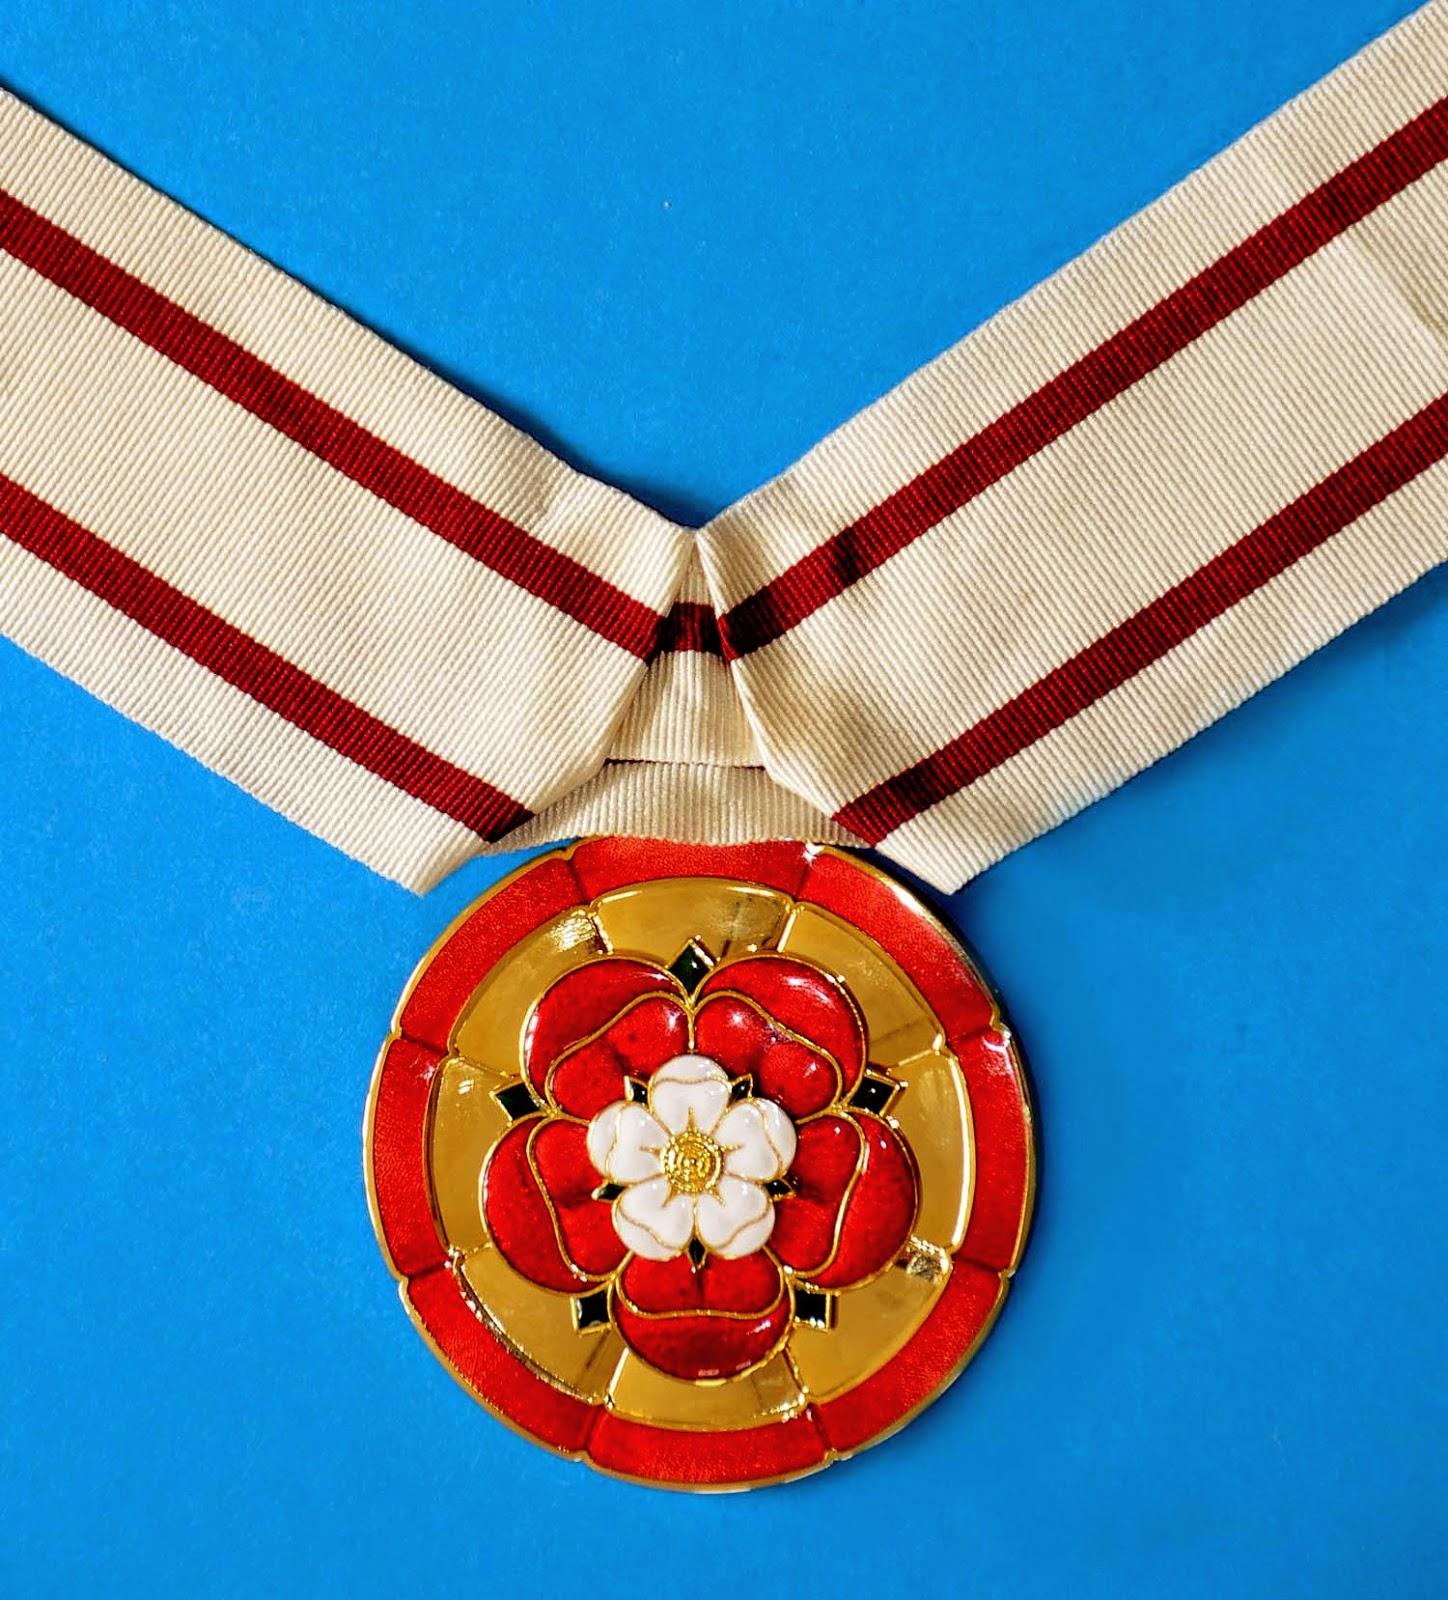 Male Deputy Lieutenant Badge  (From Lord Lieutenant of Kent website)